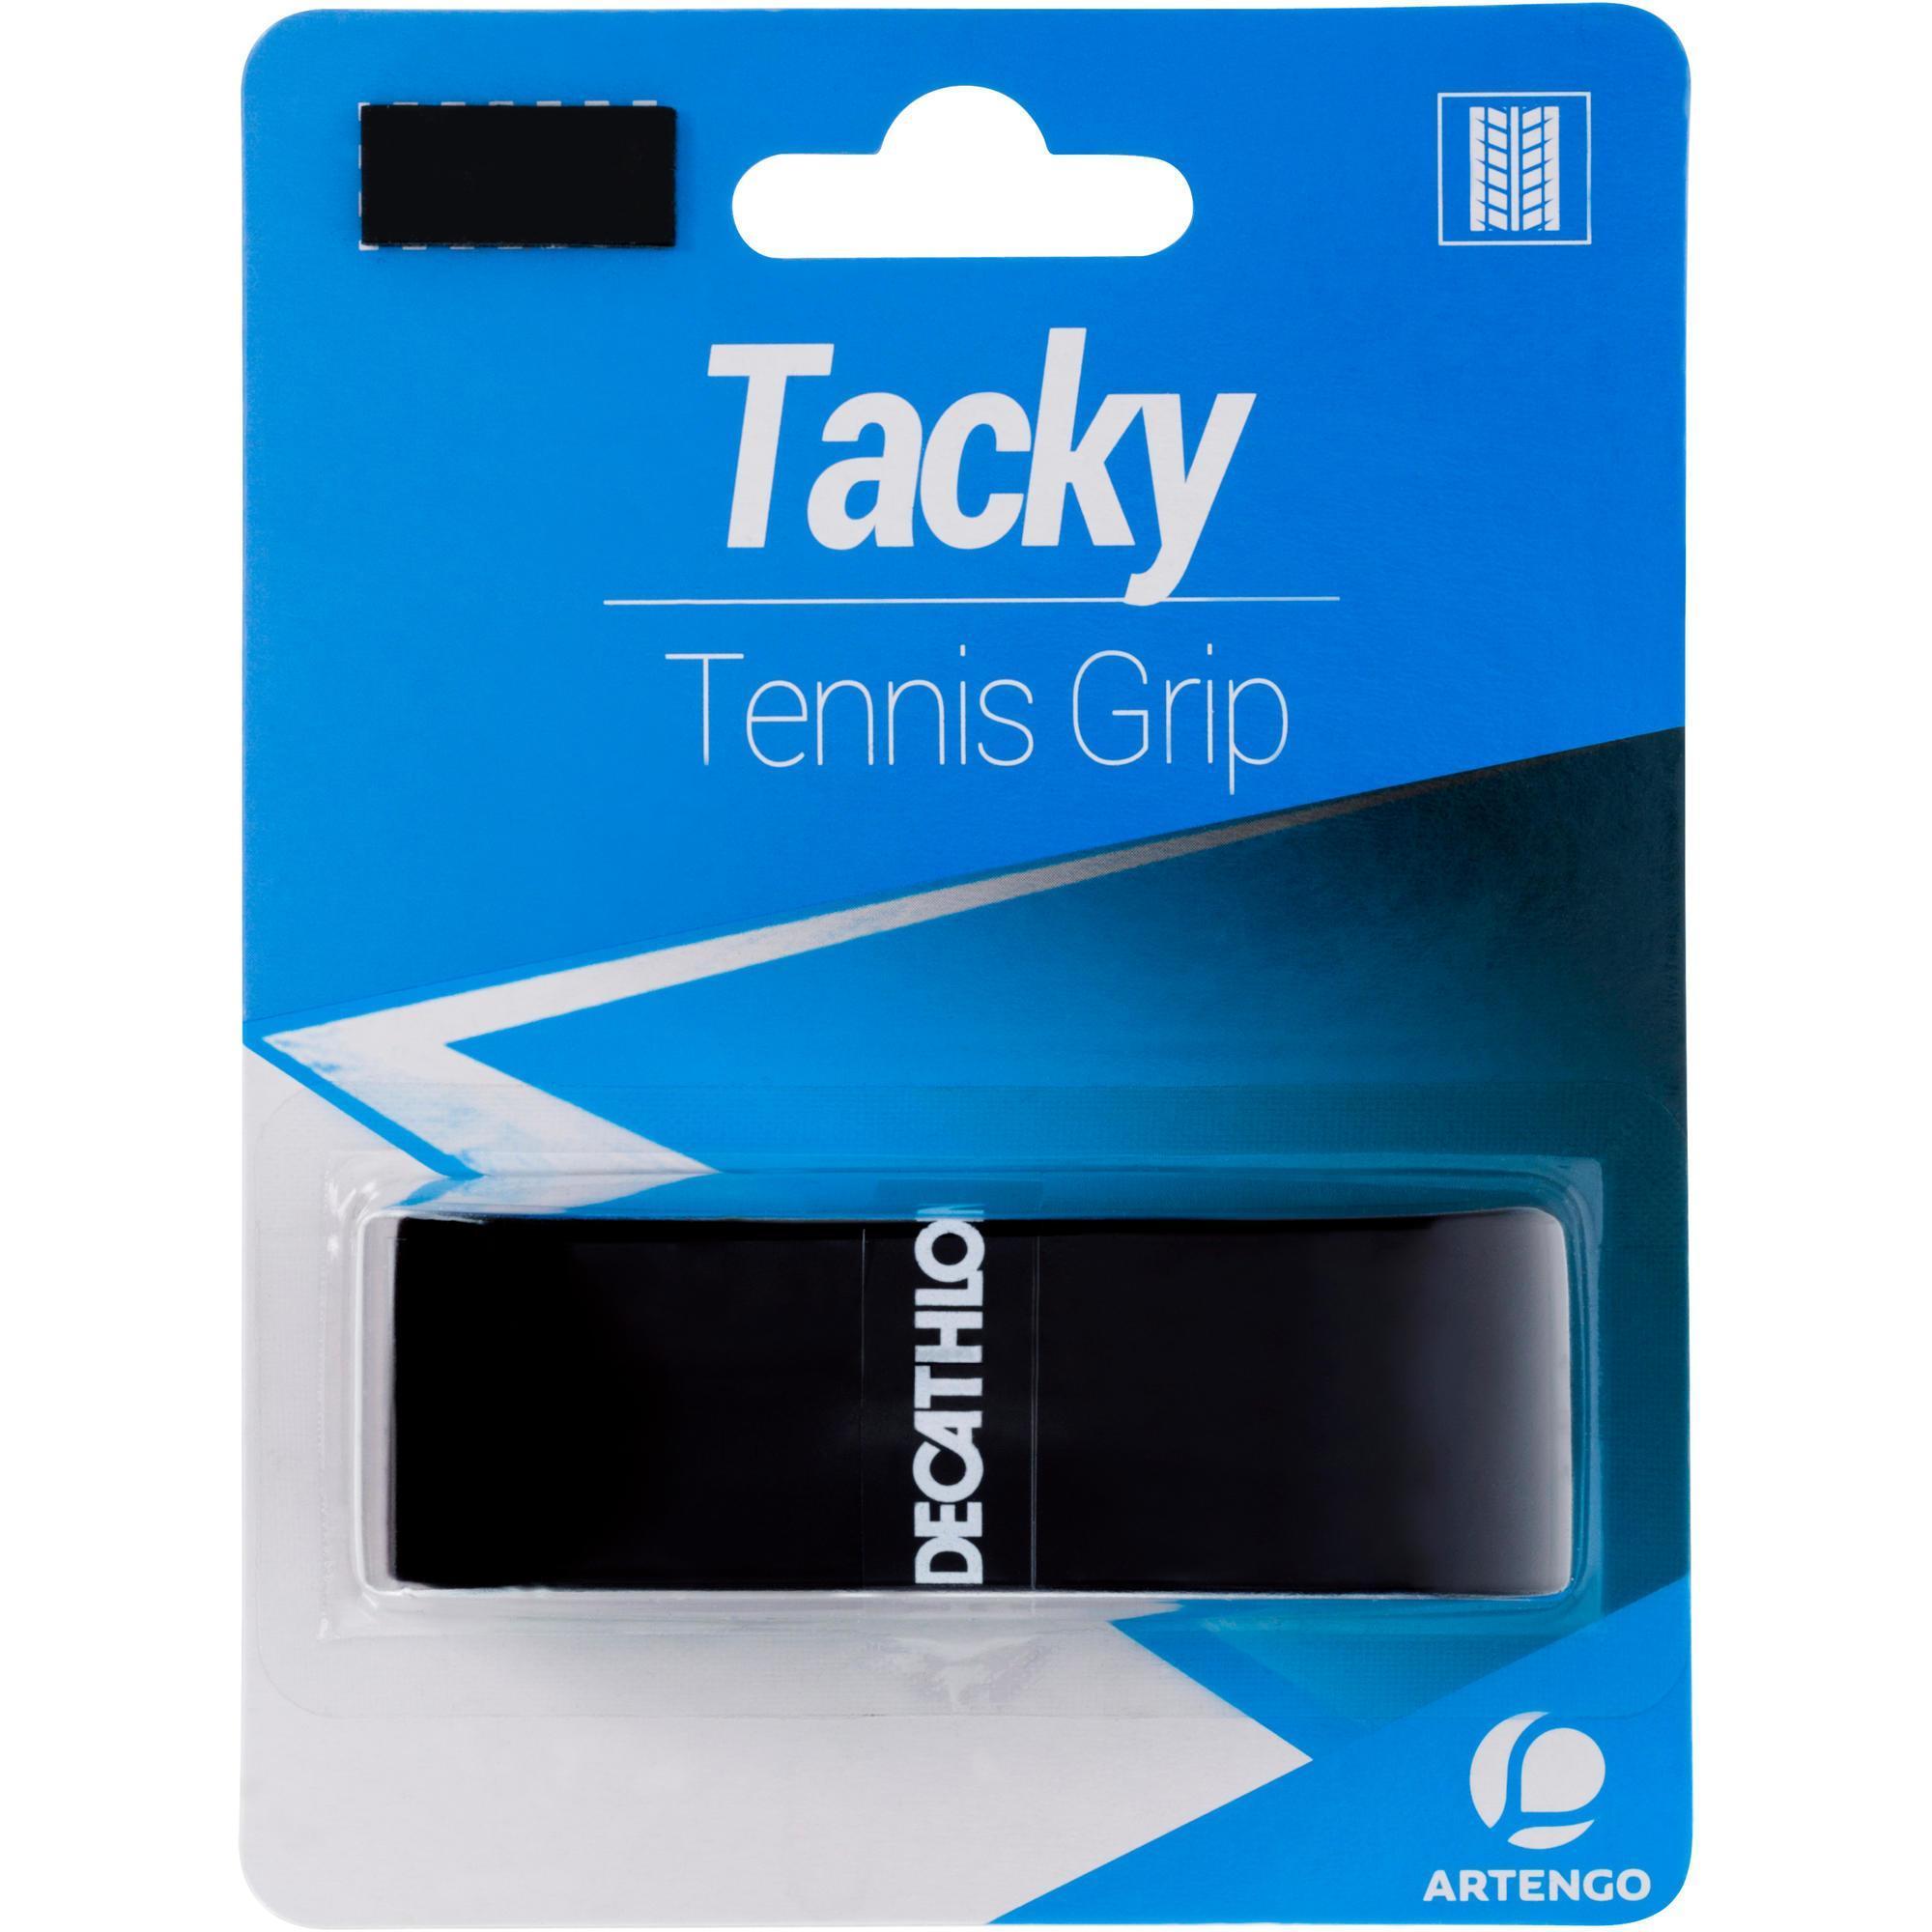 Grip de tennis artengo tacky noir artengo